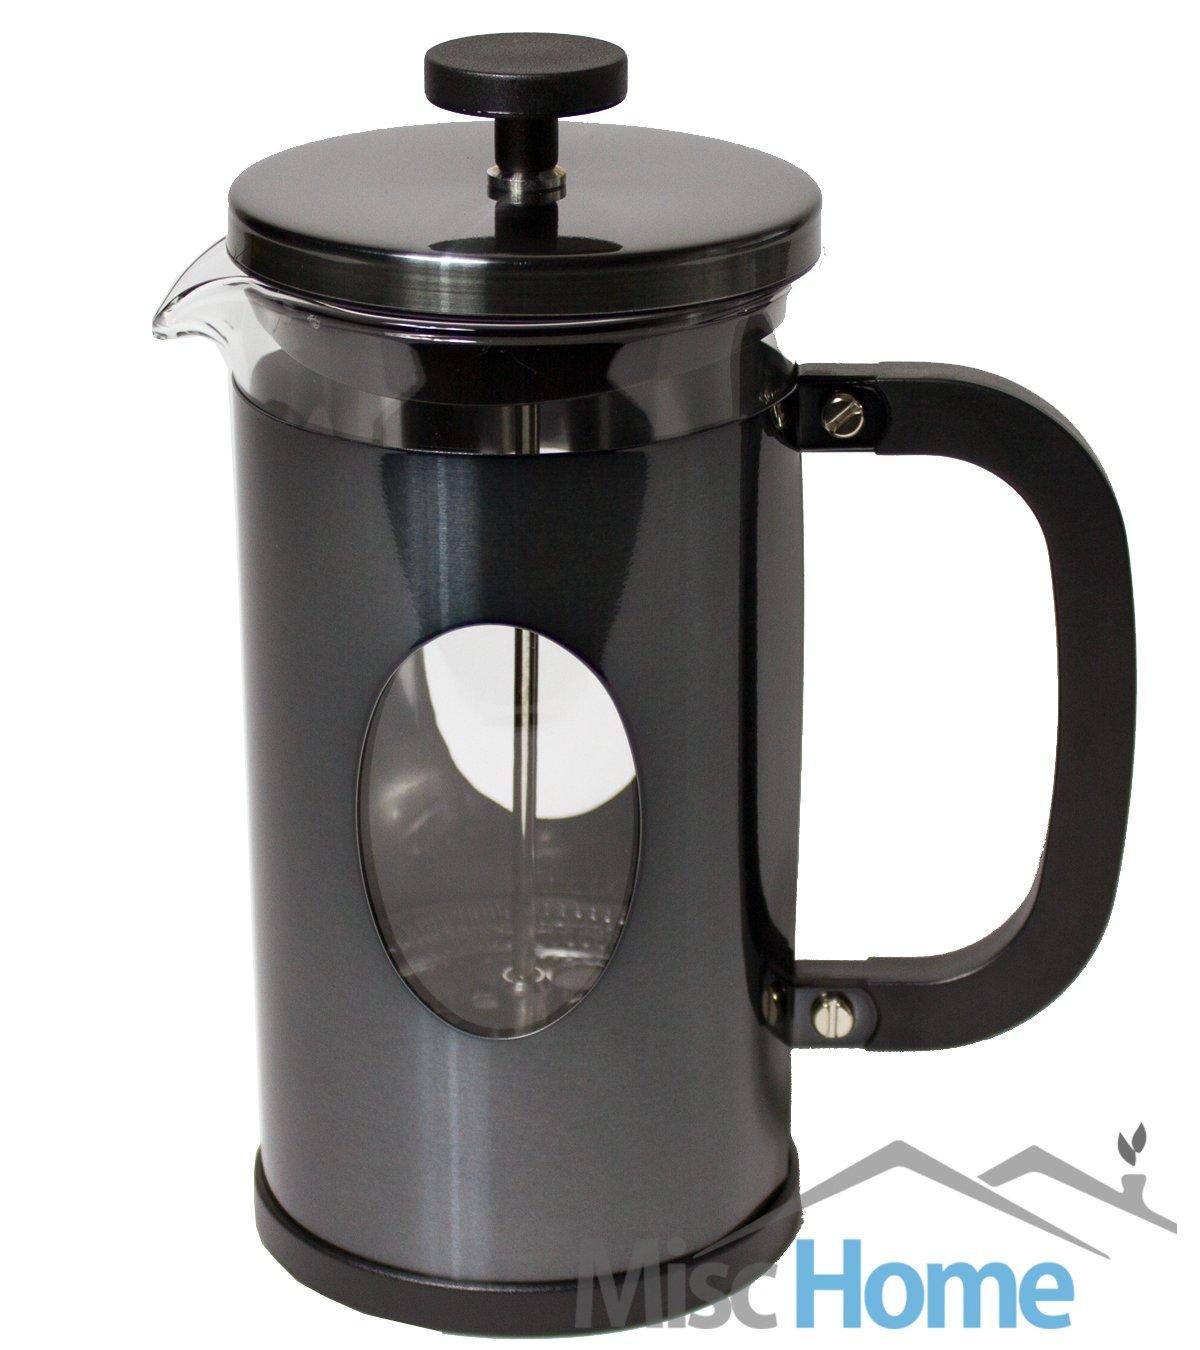 [1 Liter, 34 Oz] Gourmet Gunmetal Finish Stainless Steel French Press Coffee Maker Tea Maker, Coffee Press (Gunmetal)